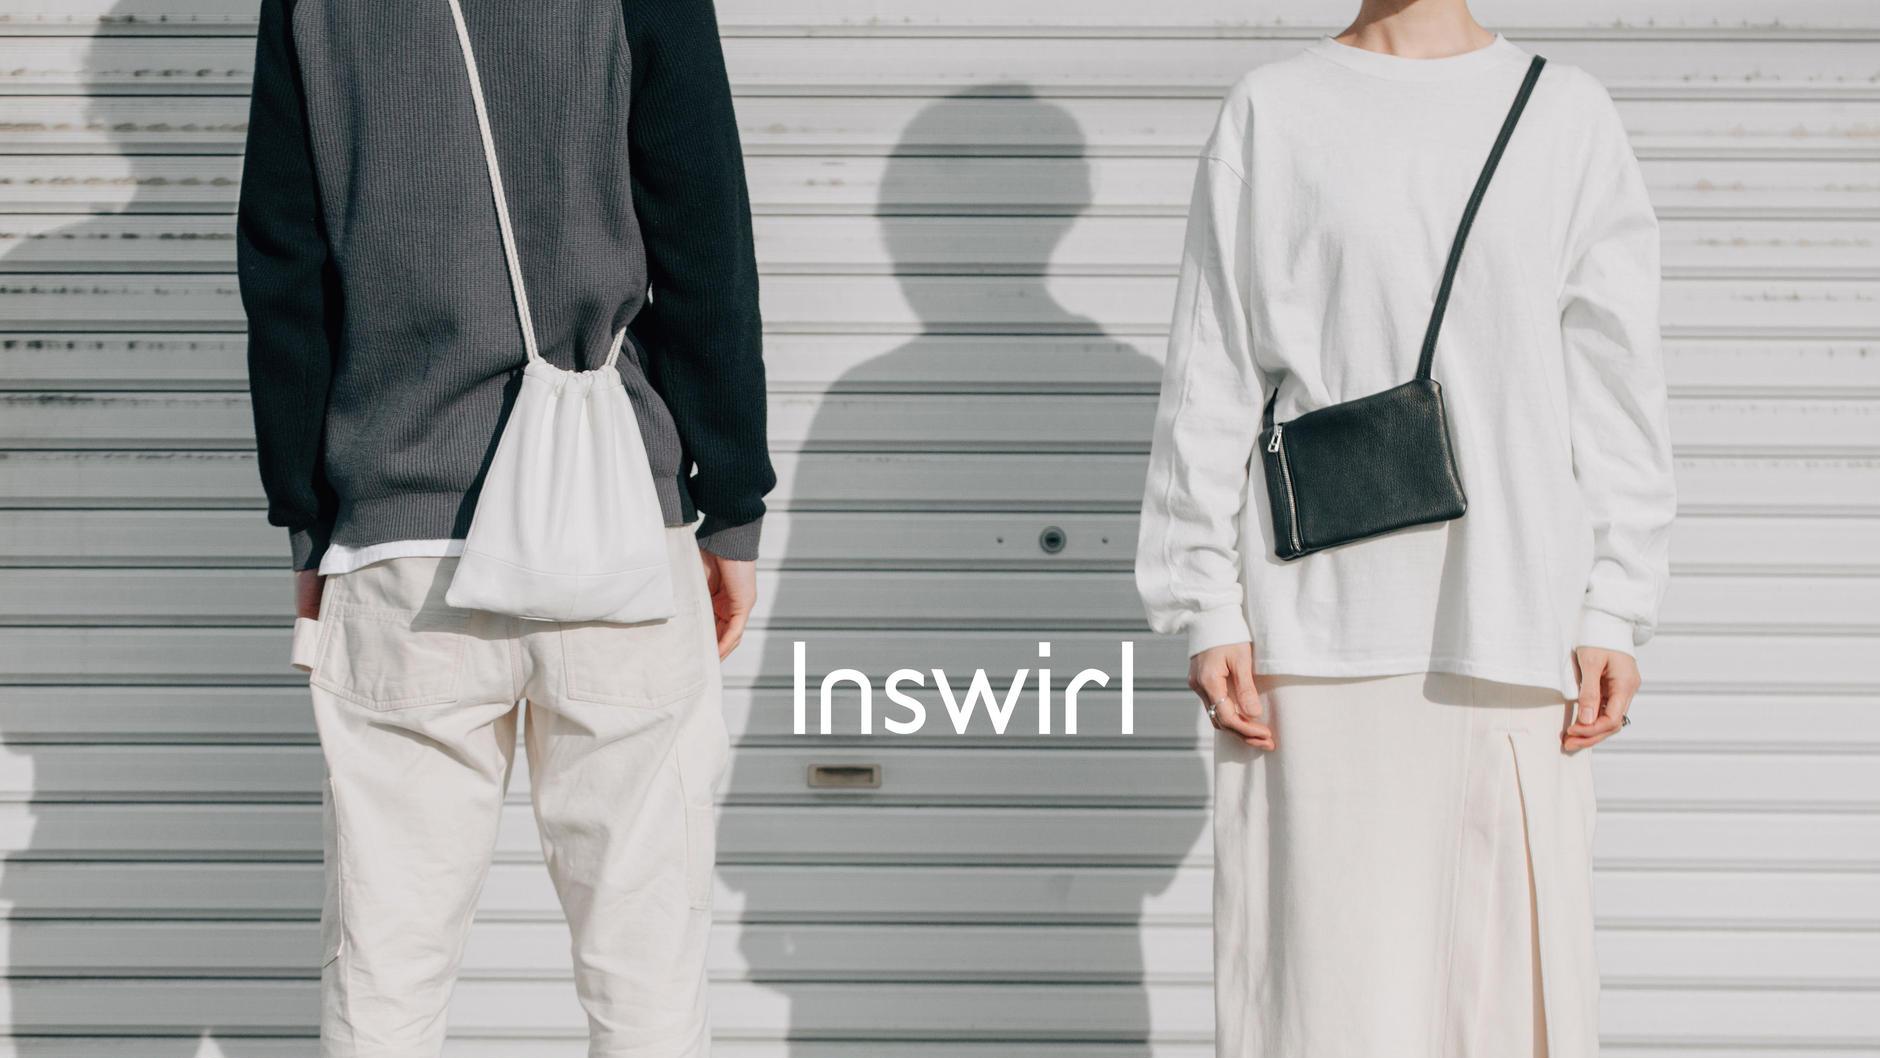 Inswirl